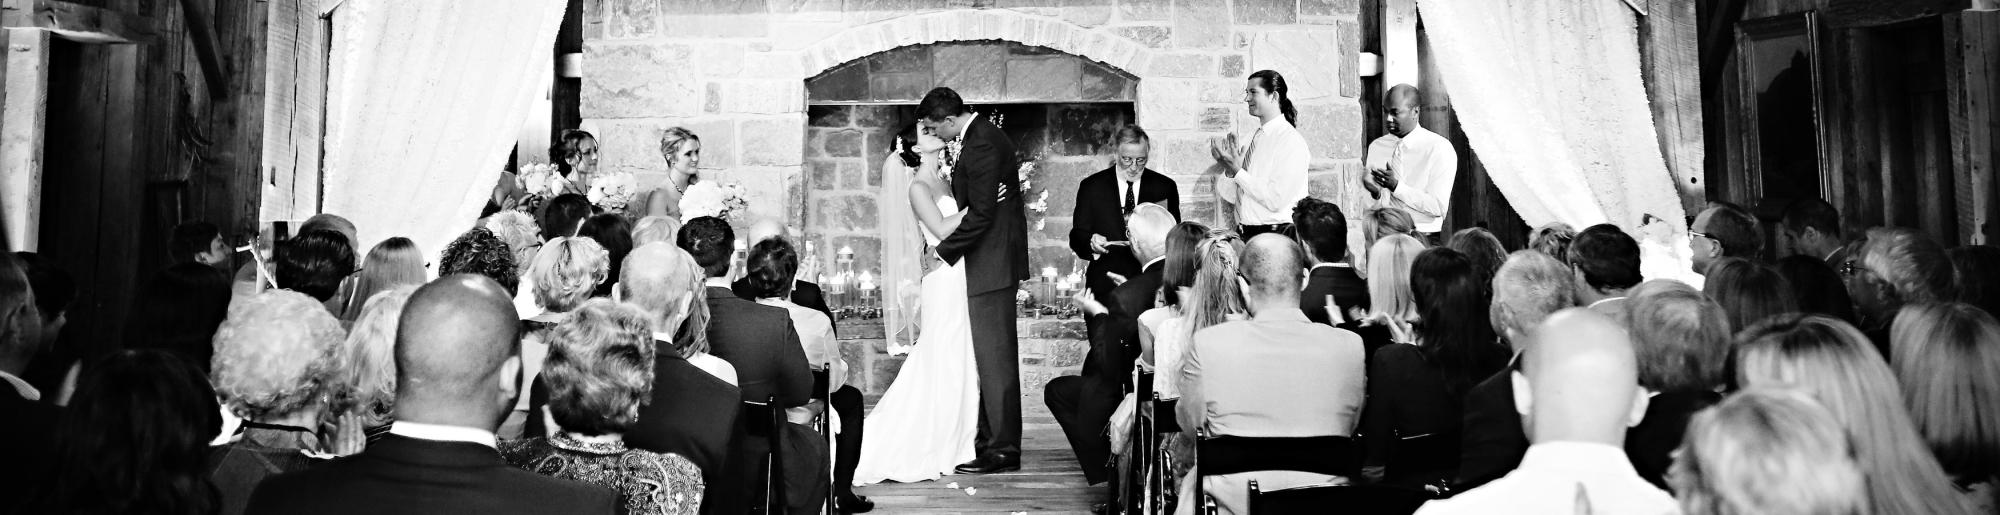 Shelby-Brian-s-Wedding-ShelbyBrian-0202-e1401912183832